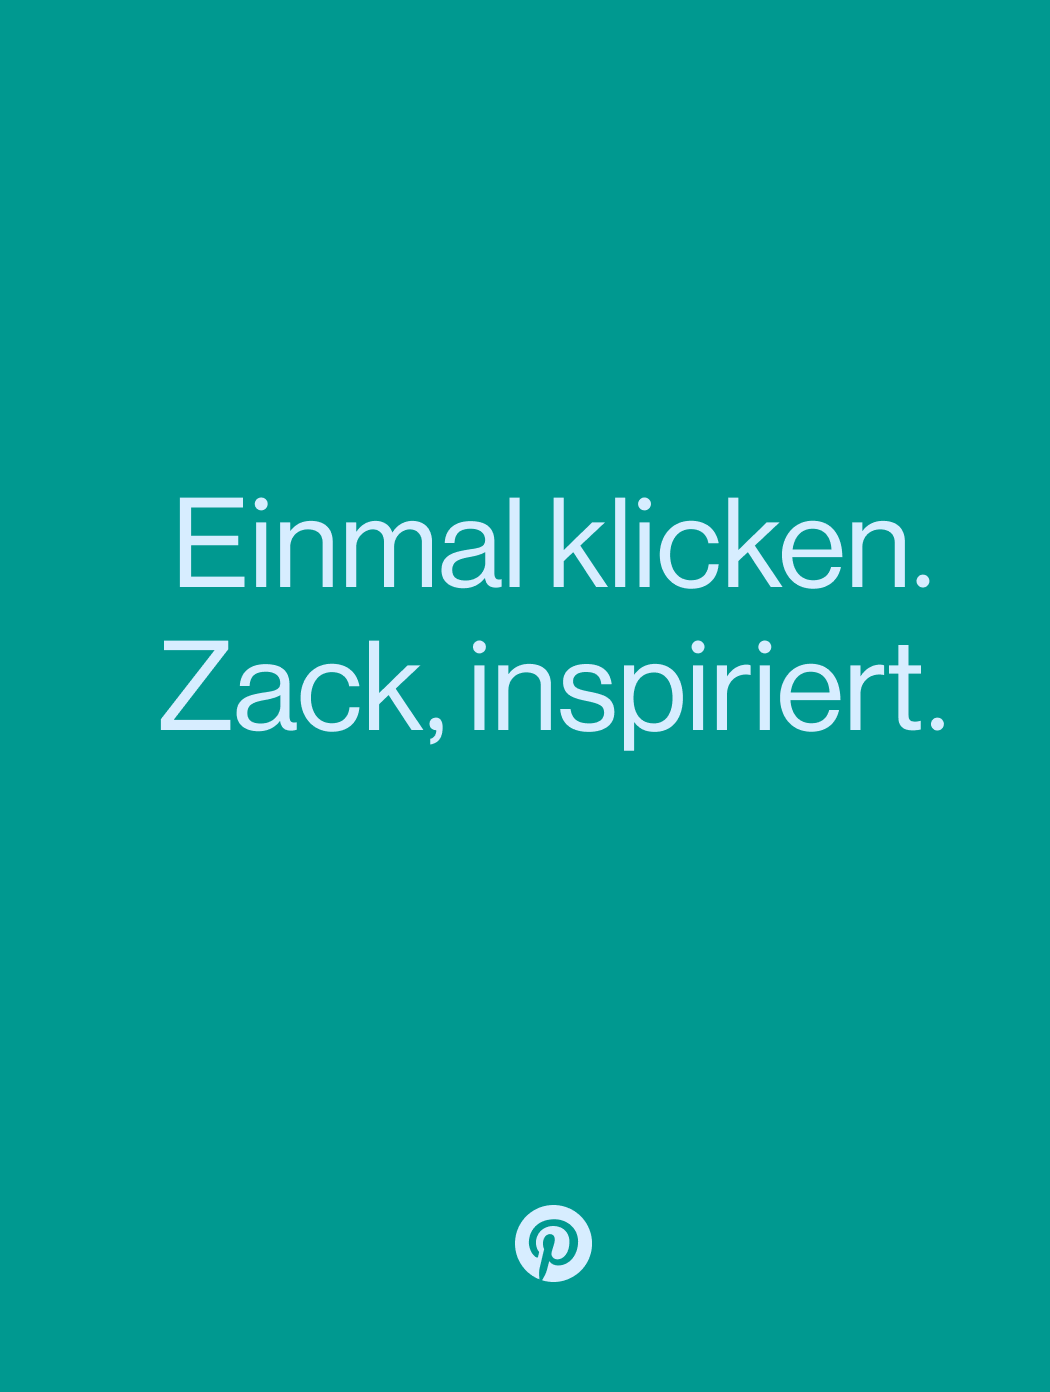 Heute schon im Pinterest Heute-Tab vorbeigeschaut?  👀 Jetzt inspirieren lassen!